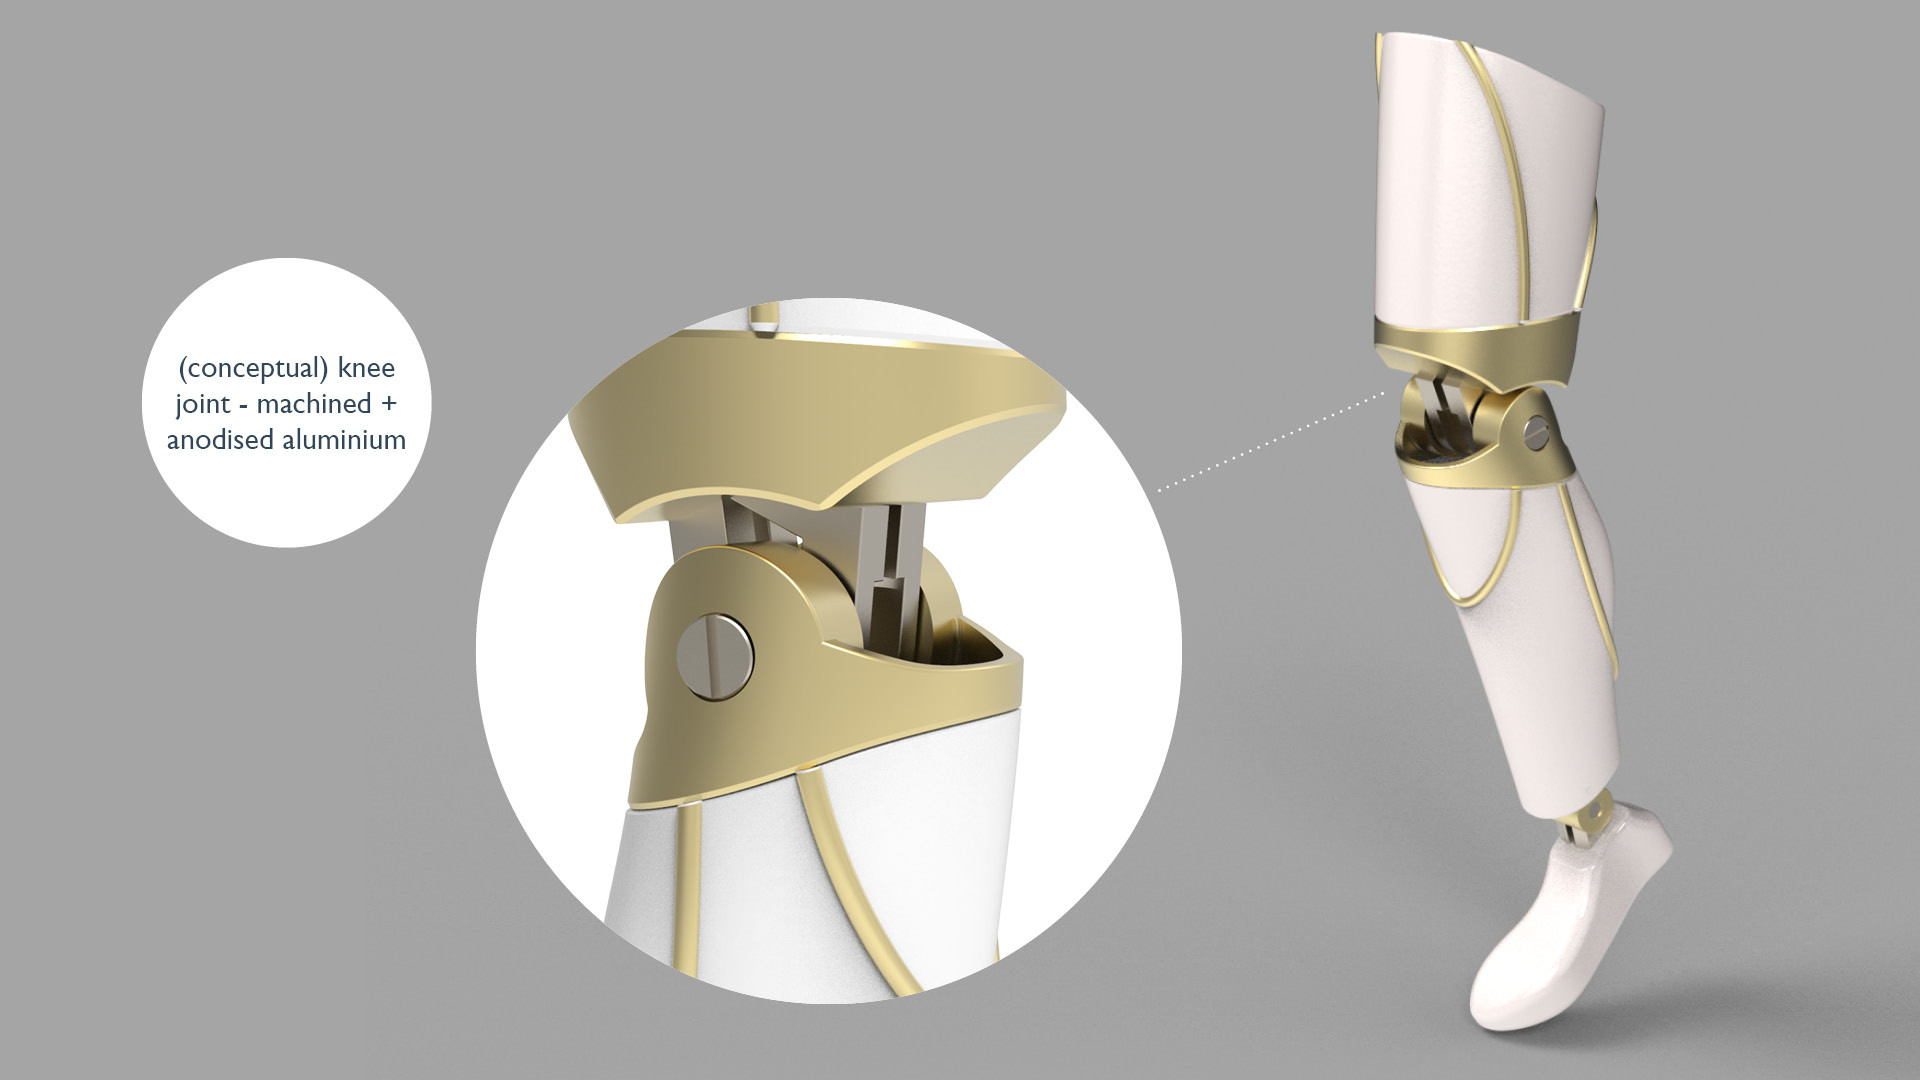 Mona Sharma Design Exercise website22.jp